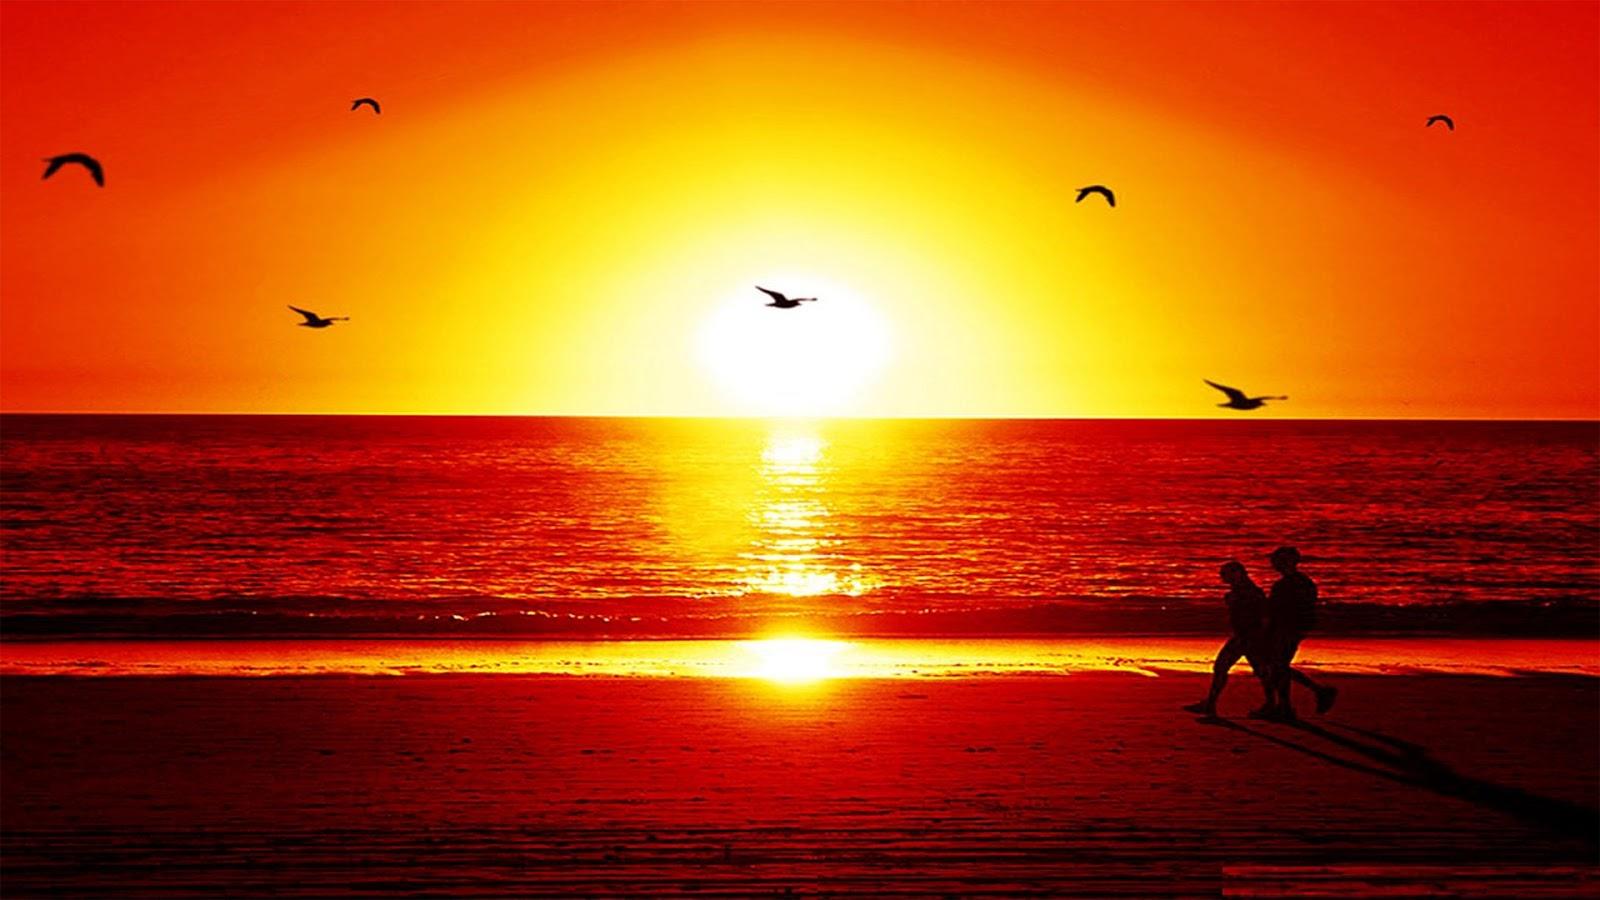 Super Frasi sul tramonto - Frasi, aforismi e citazioni IG82